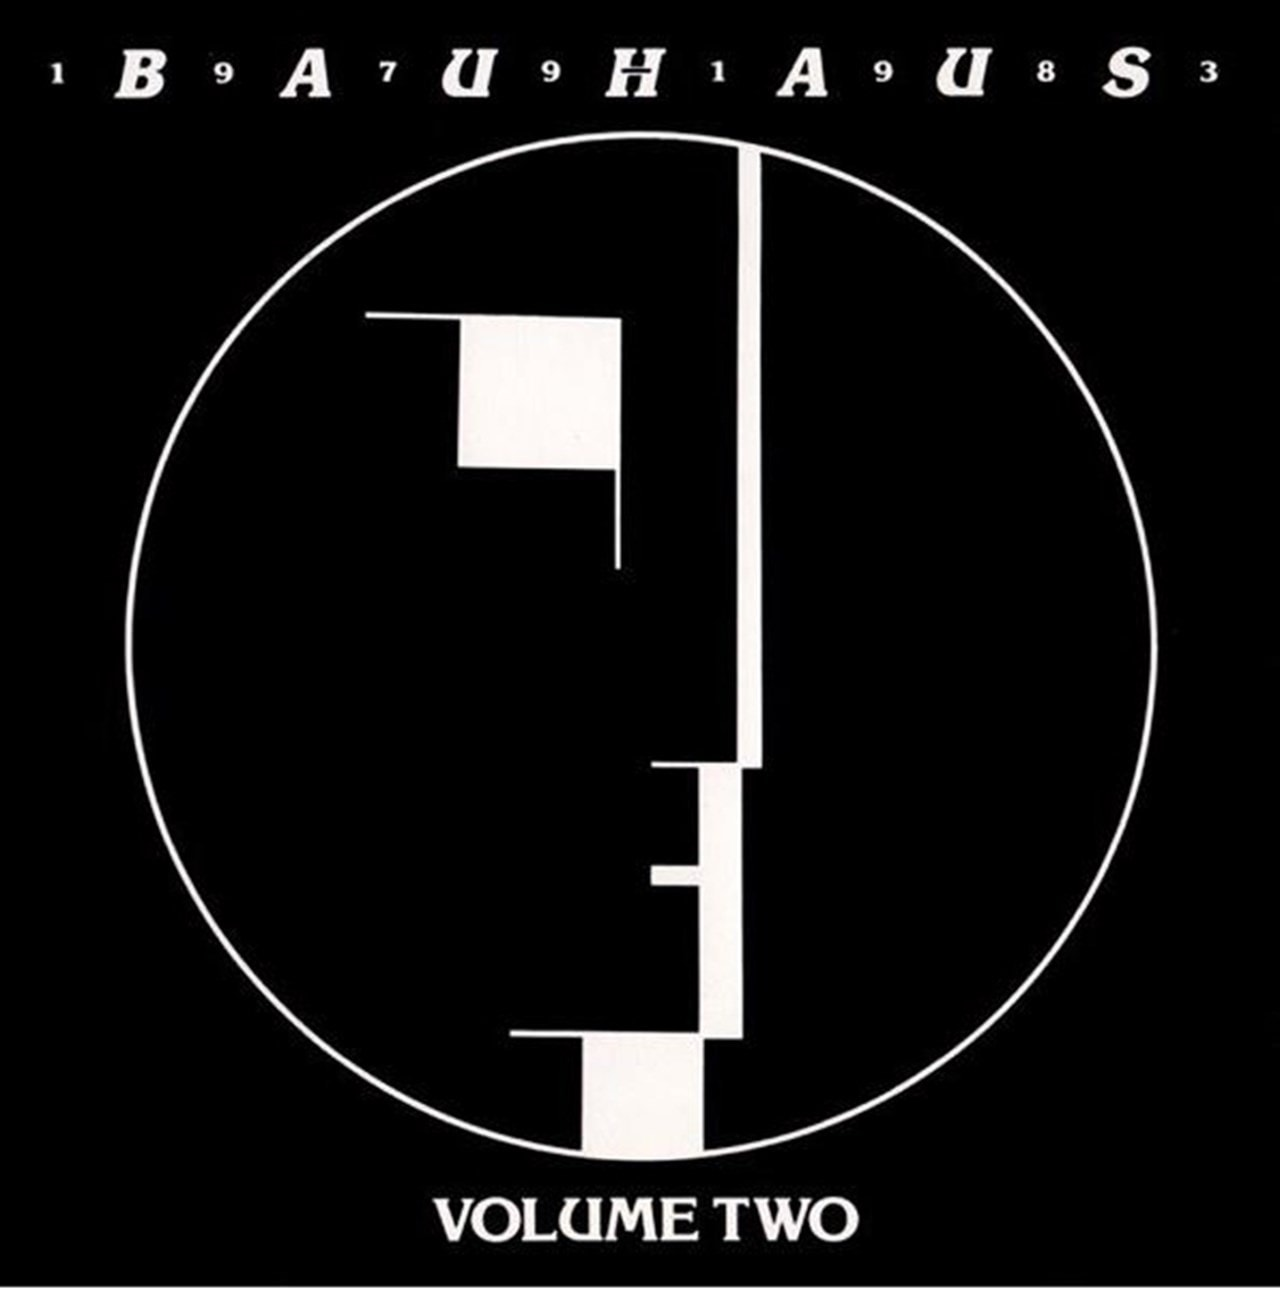 1979-1983 - Volume 2 - 1